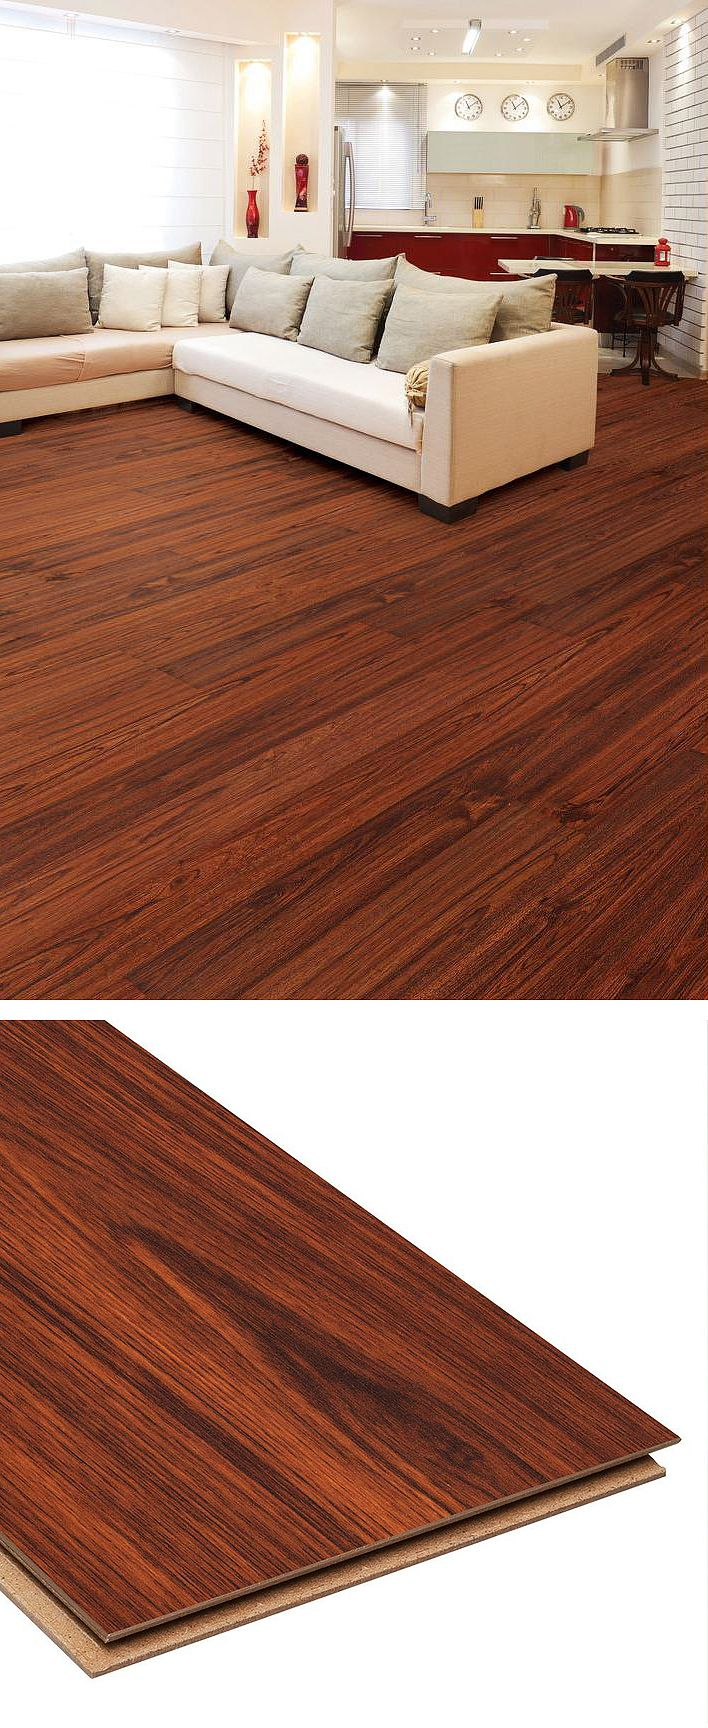 Greenguard certified laminate flooring gurus floor for Wood floor joint guard